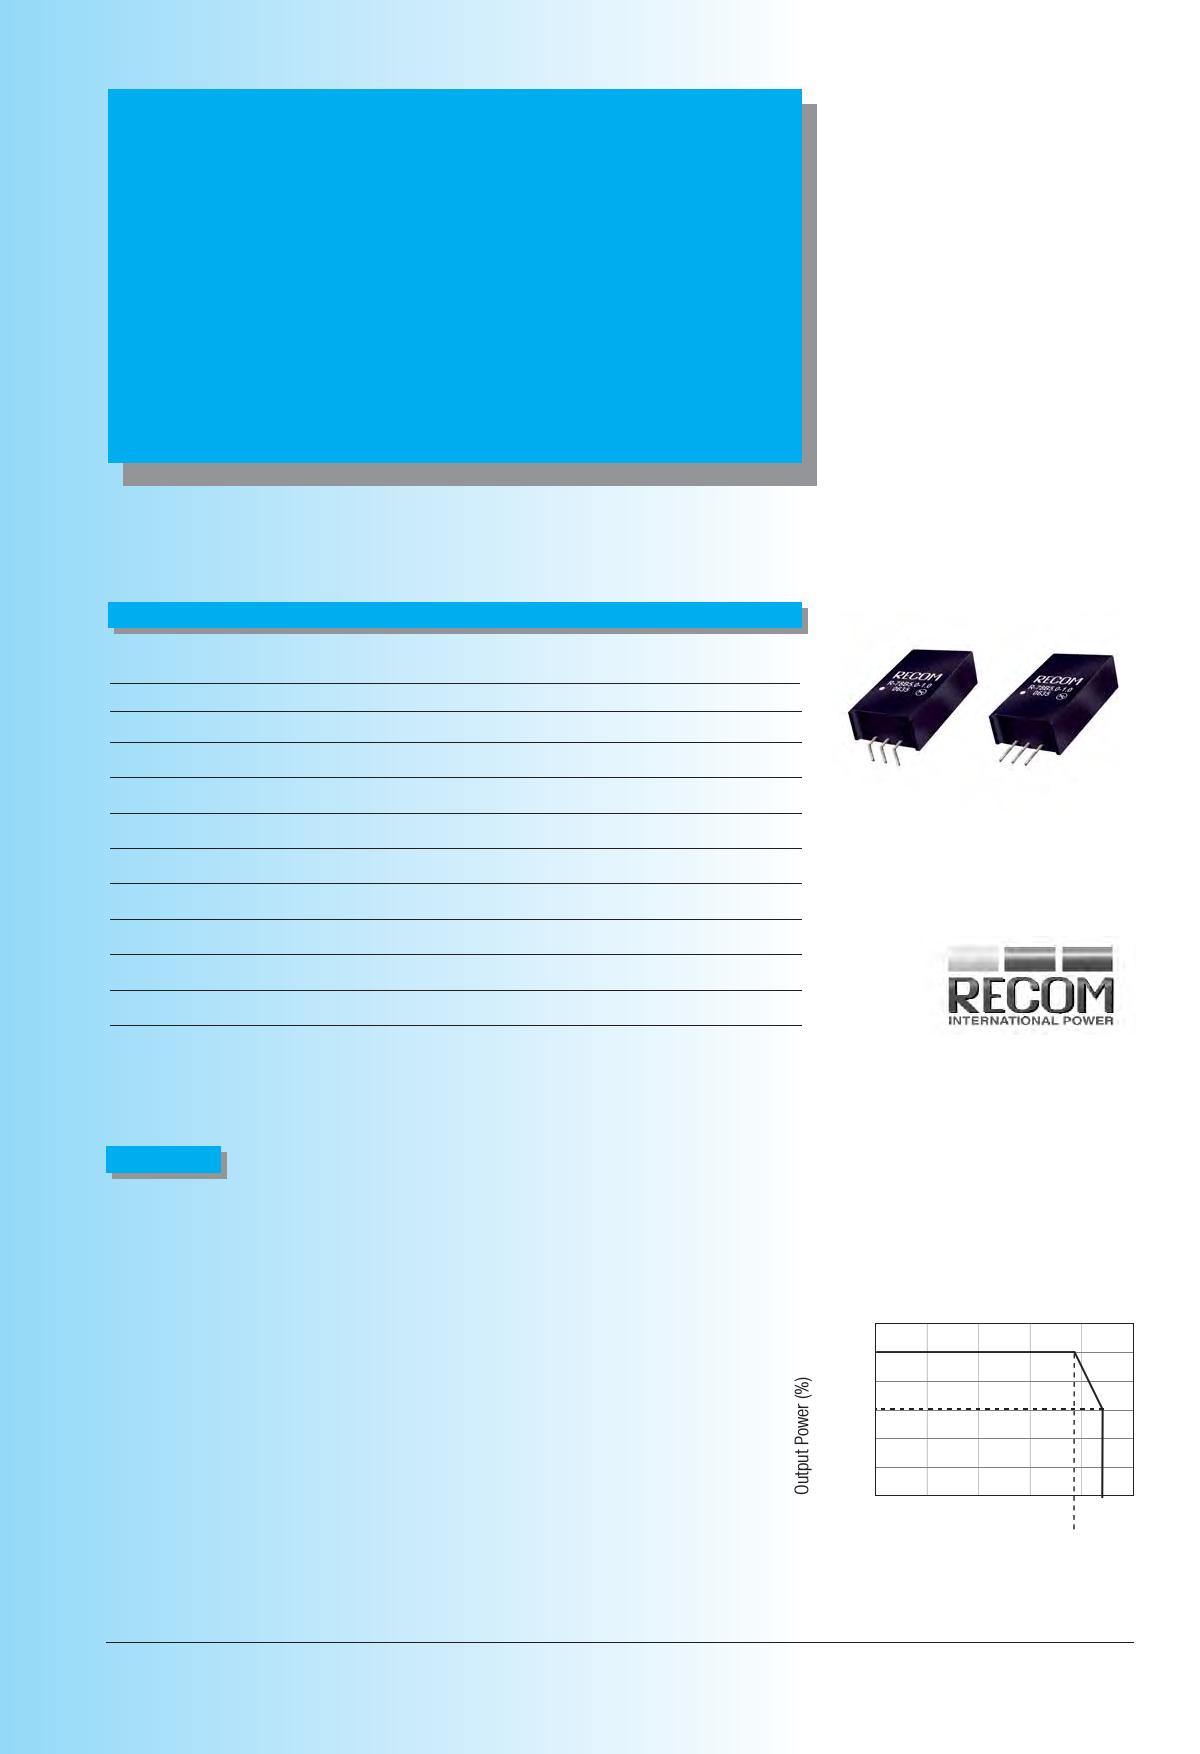 R-78Bxx-1.0 Hoja de datos, Descripción, Manual